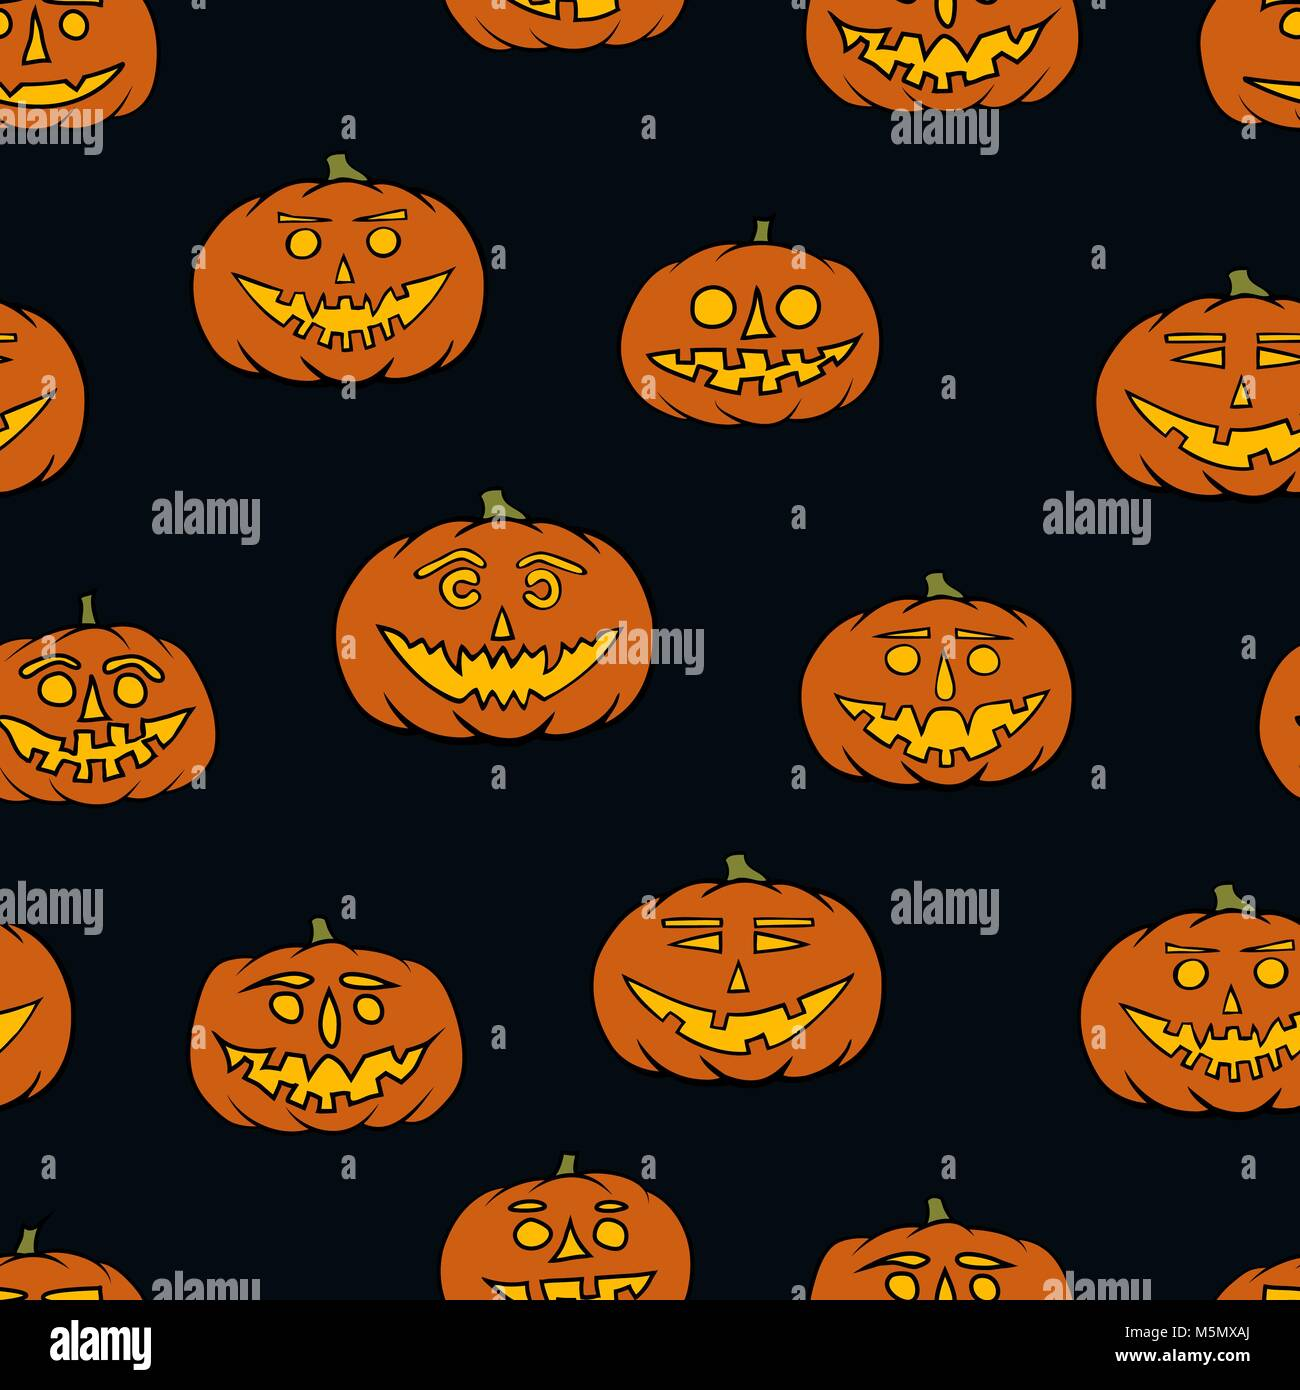 Hand Drawn Jack O Lantern Seamless Pattern Halloween Background Stock Vector Image Art Alamy